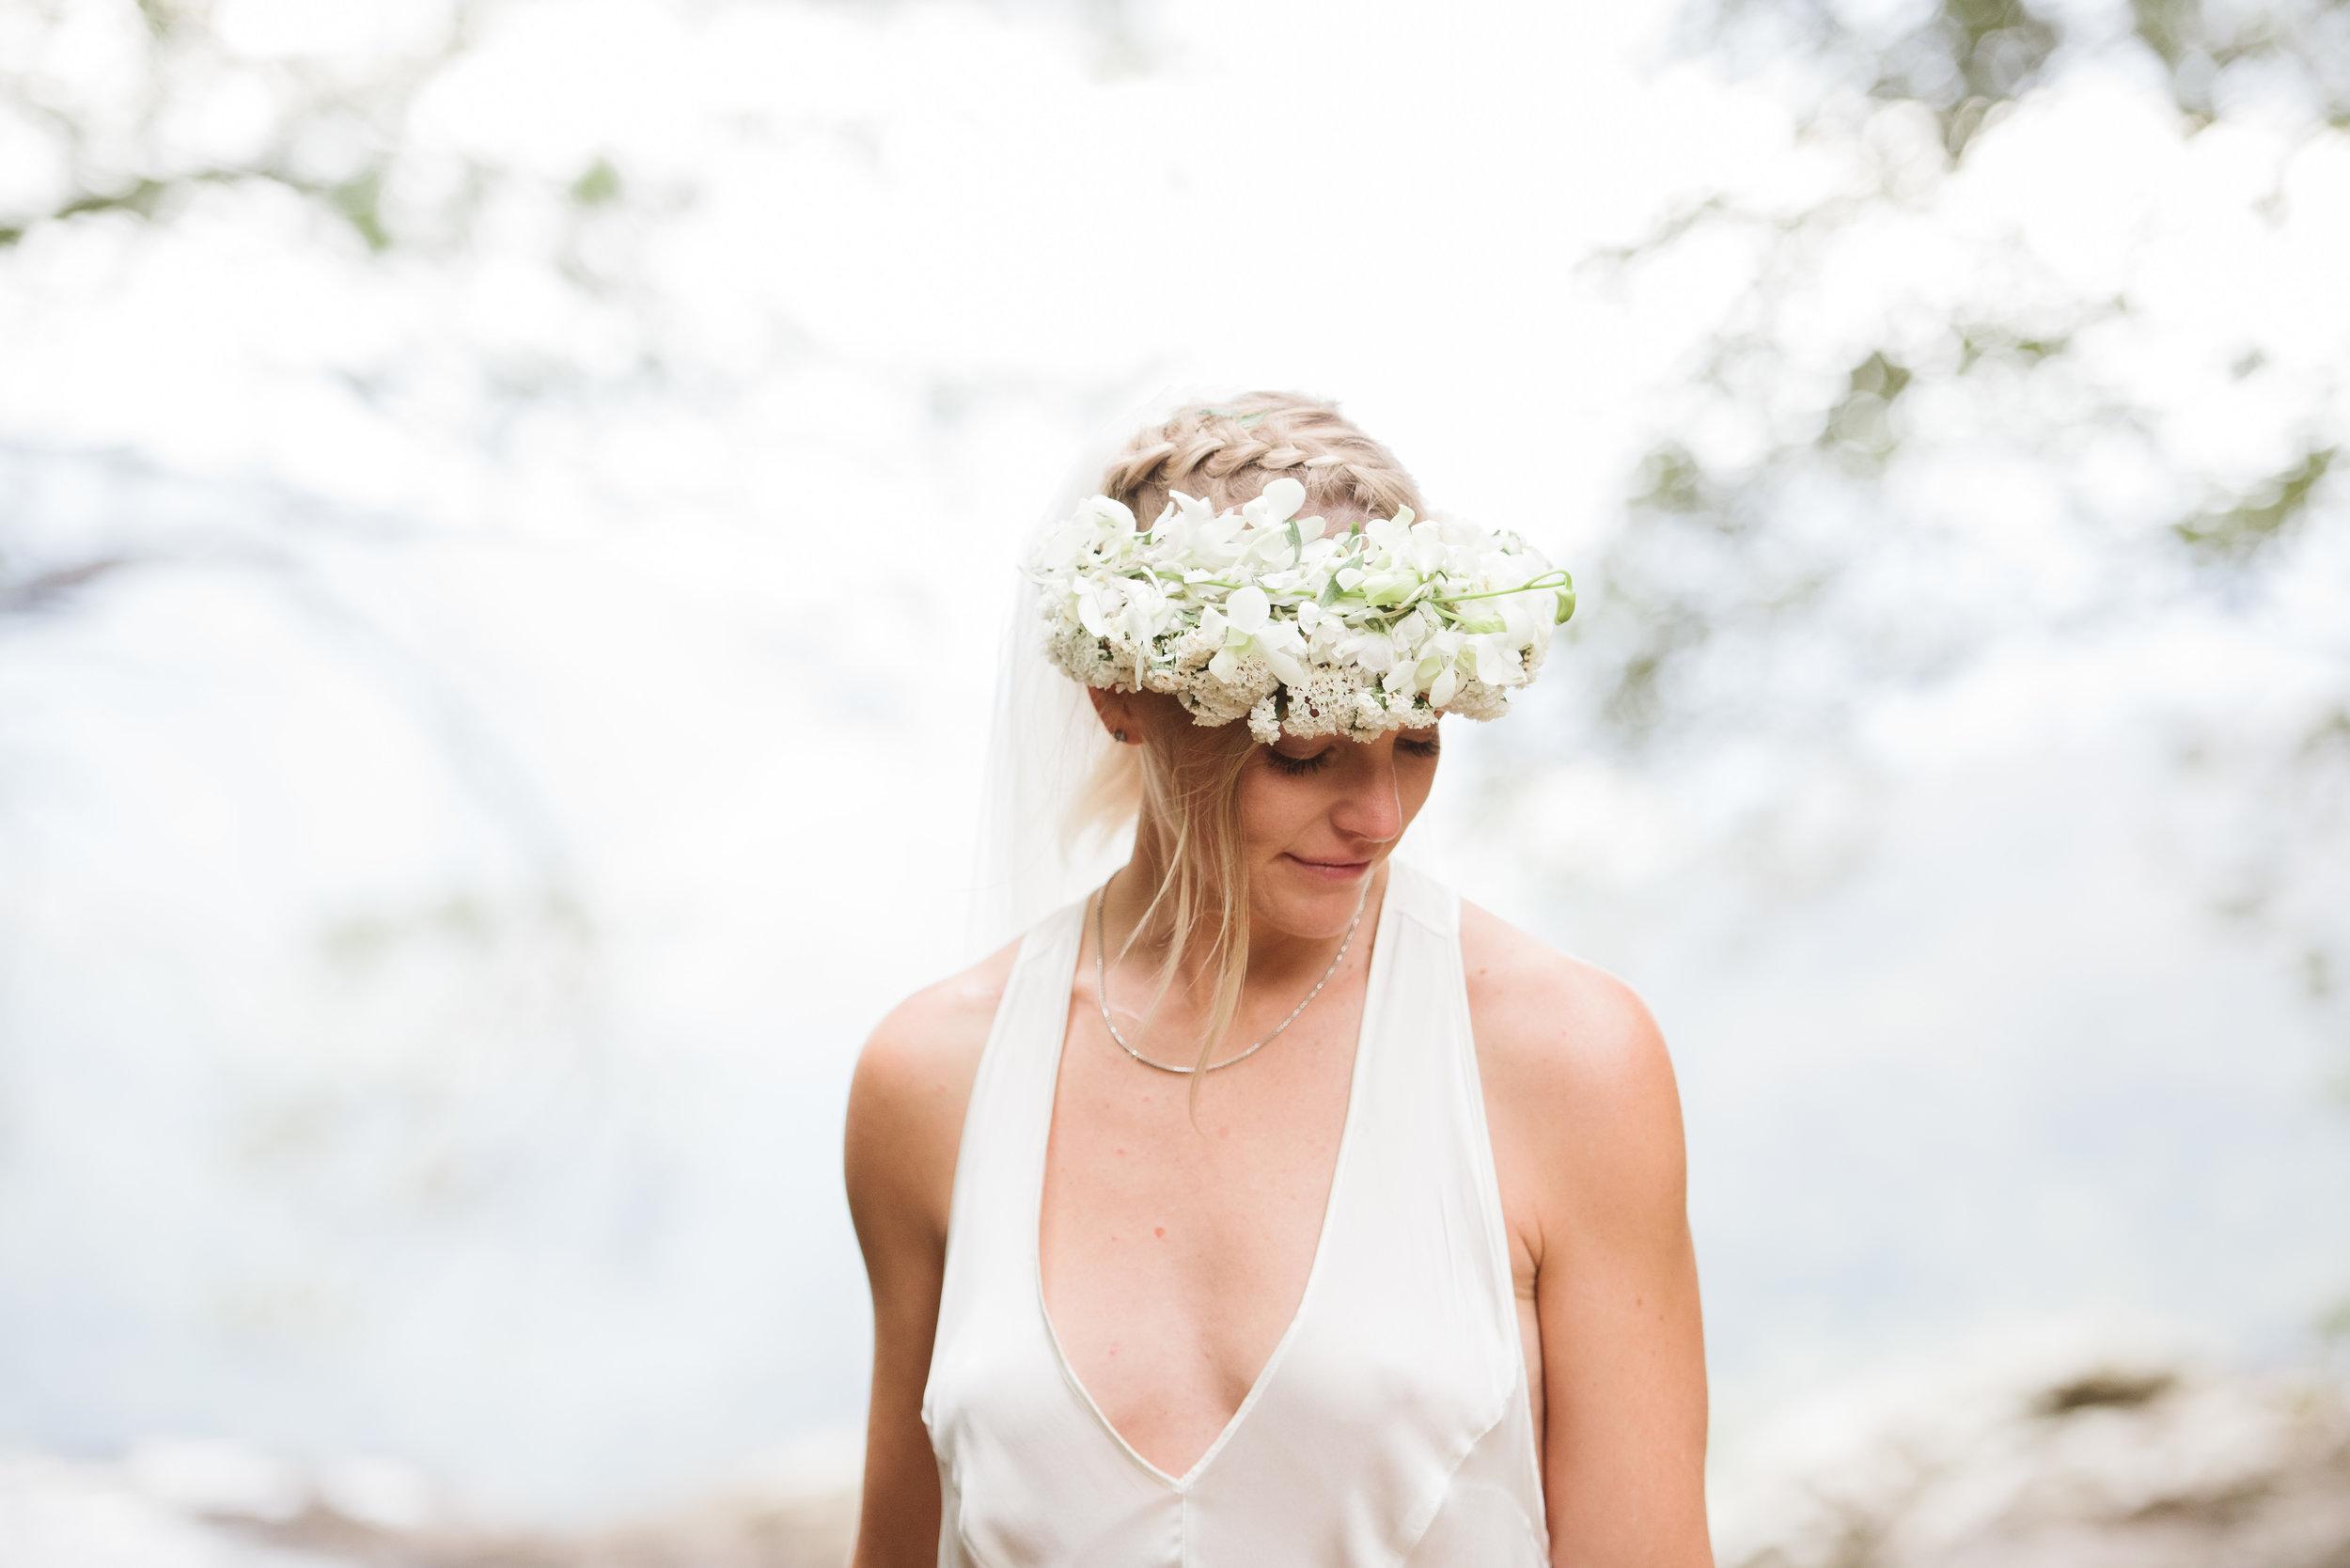 Carla and Luke- wedding photographer, byron bay wedding and family photographer, tweed heads wedding and family photography-296.jpg